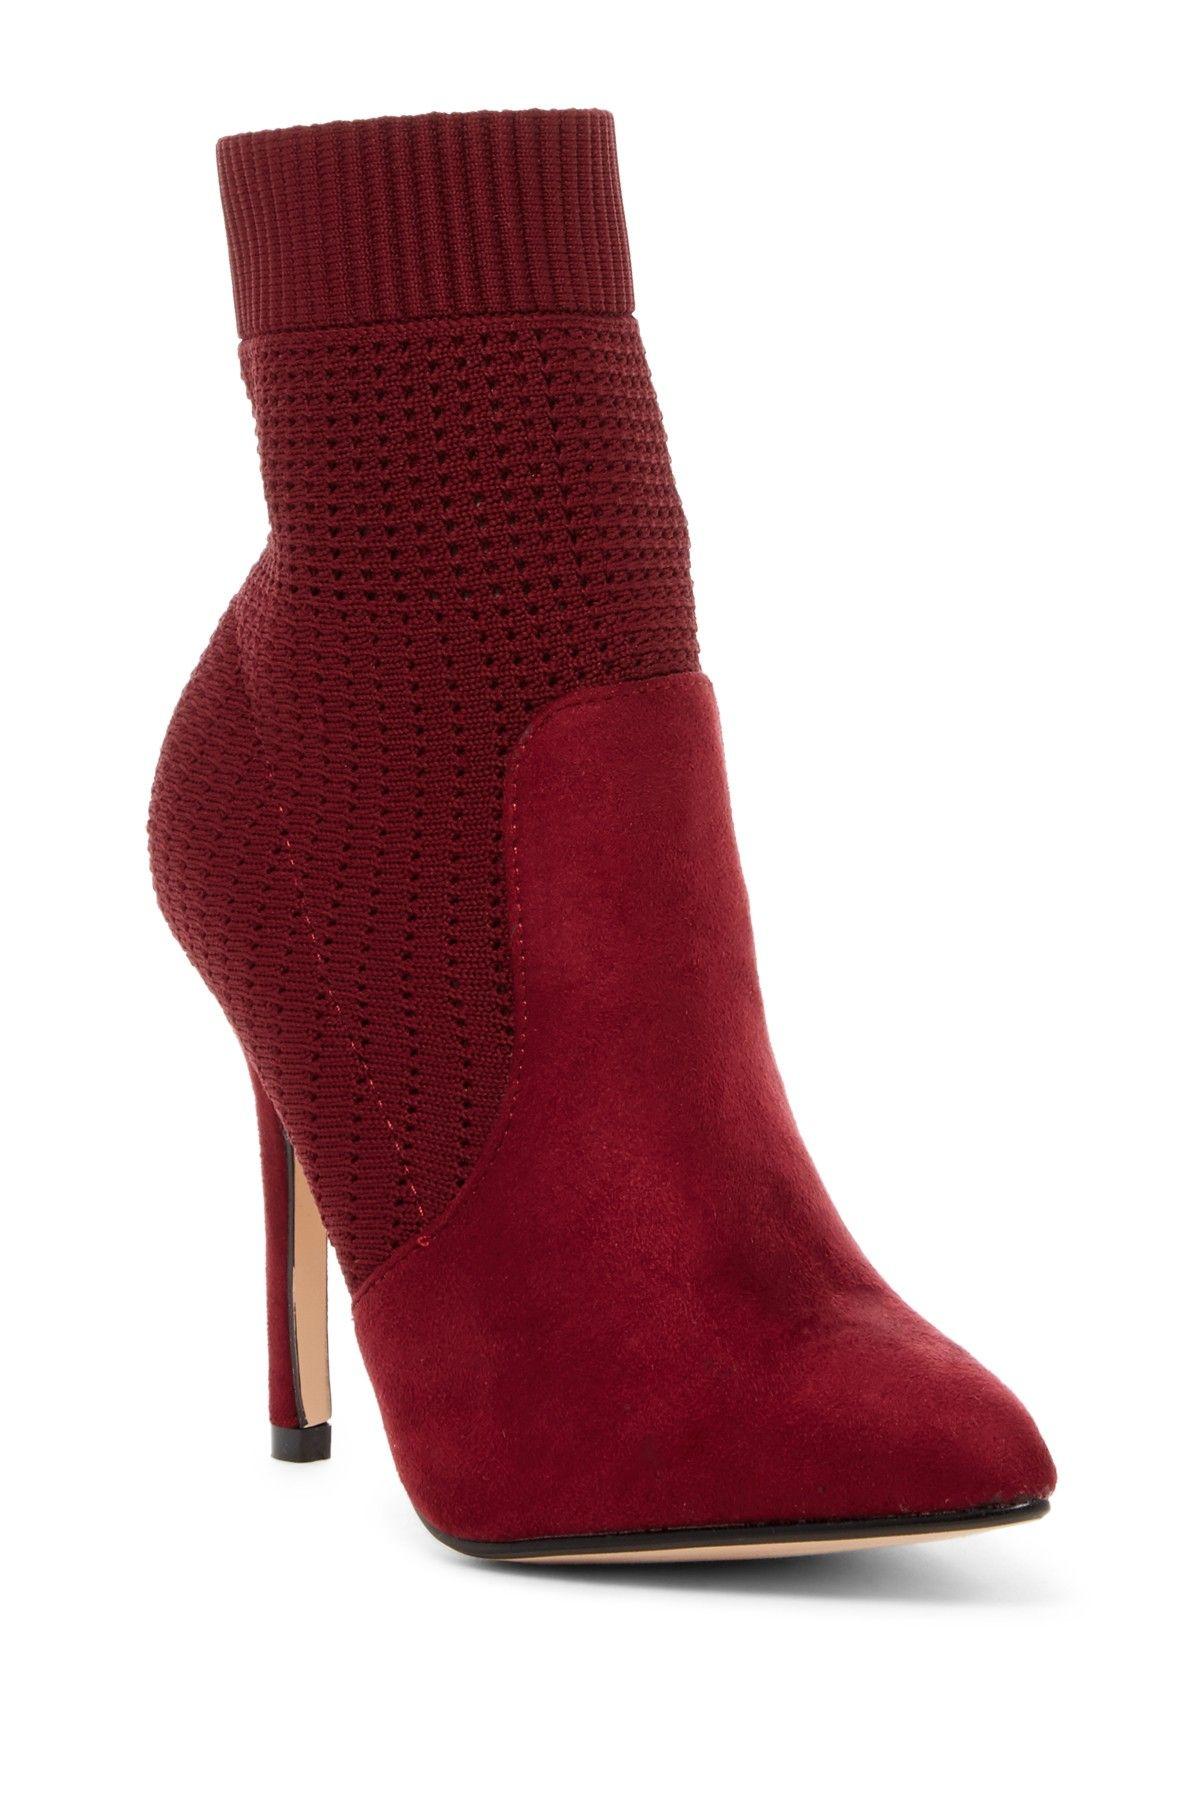 d453a638dd7 Catherine Catherine Malandrino Knat Sock Stiletto Heel Bootie ...